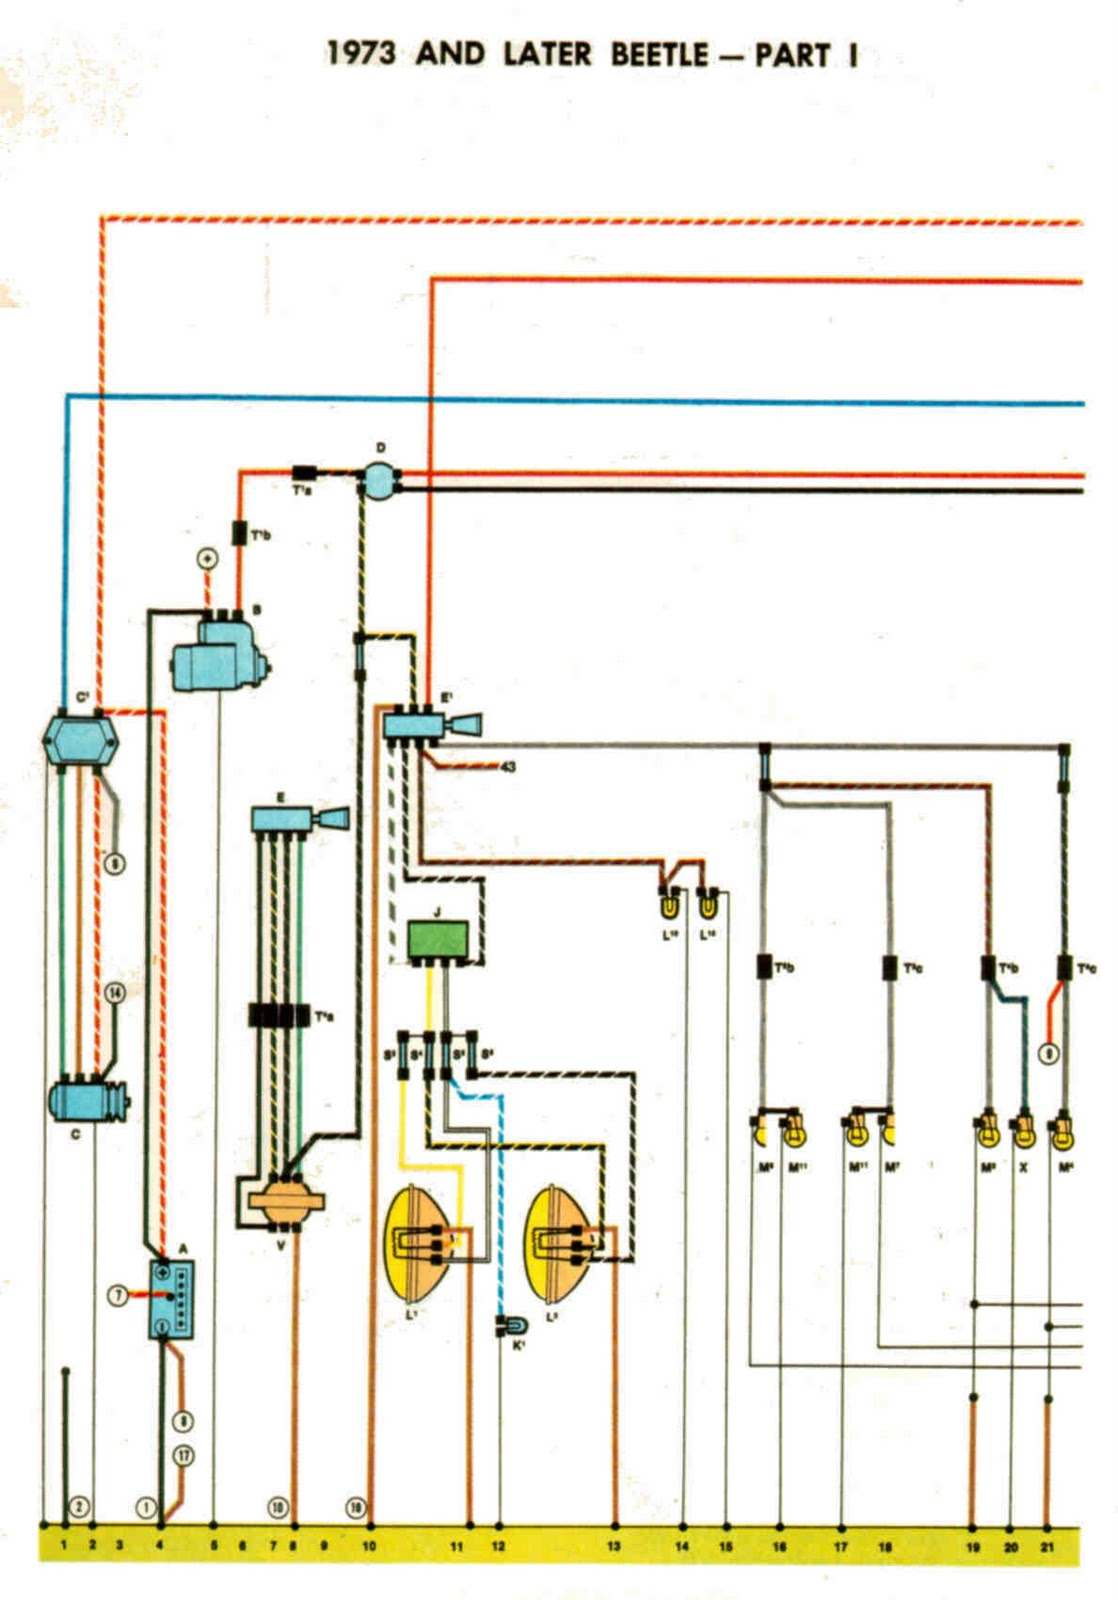 Vw Beetle Wiring Diagram 1972 Dah Experts Of Famous Volkswagen Hotel Evacuation Plan Rh Rfid Locker Co 1959